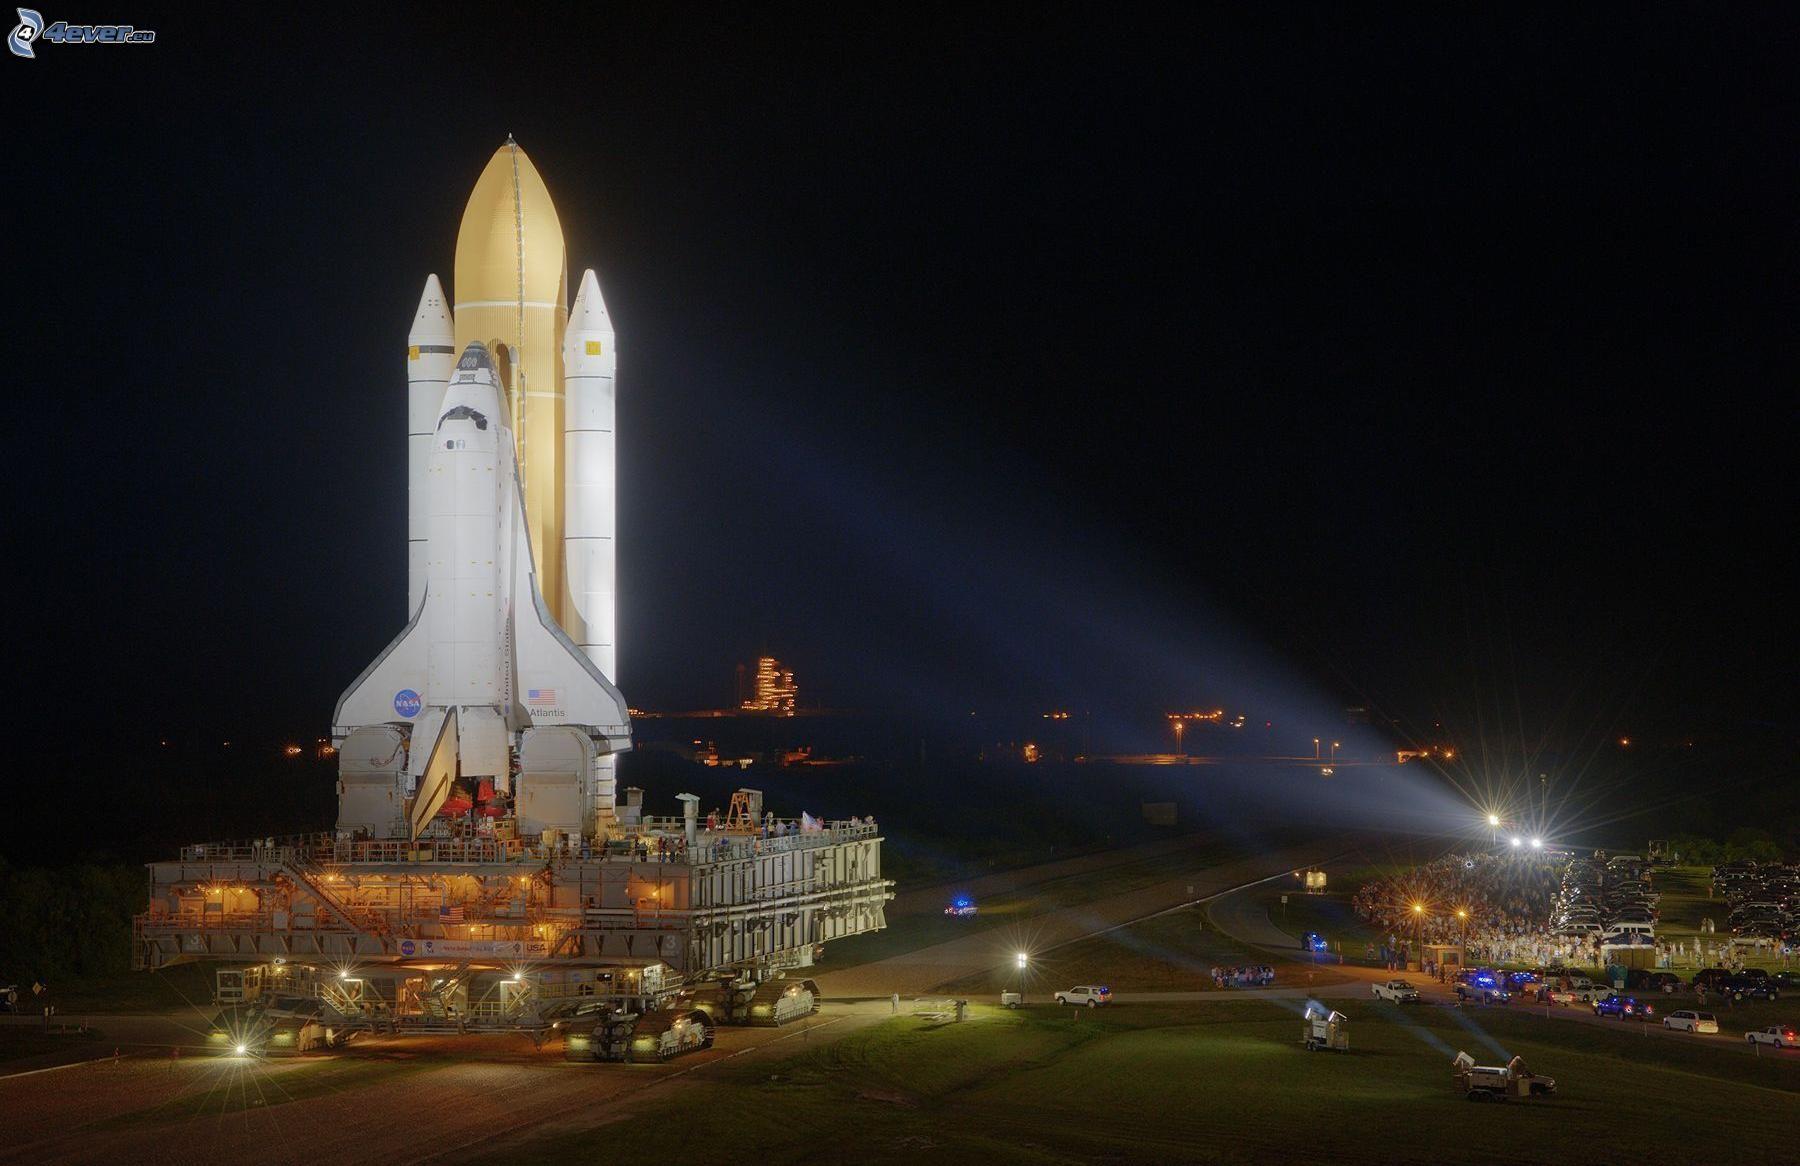 atlantis space shuttle night launch - photo #30